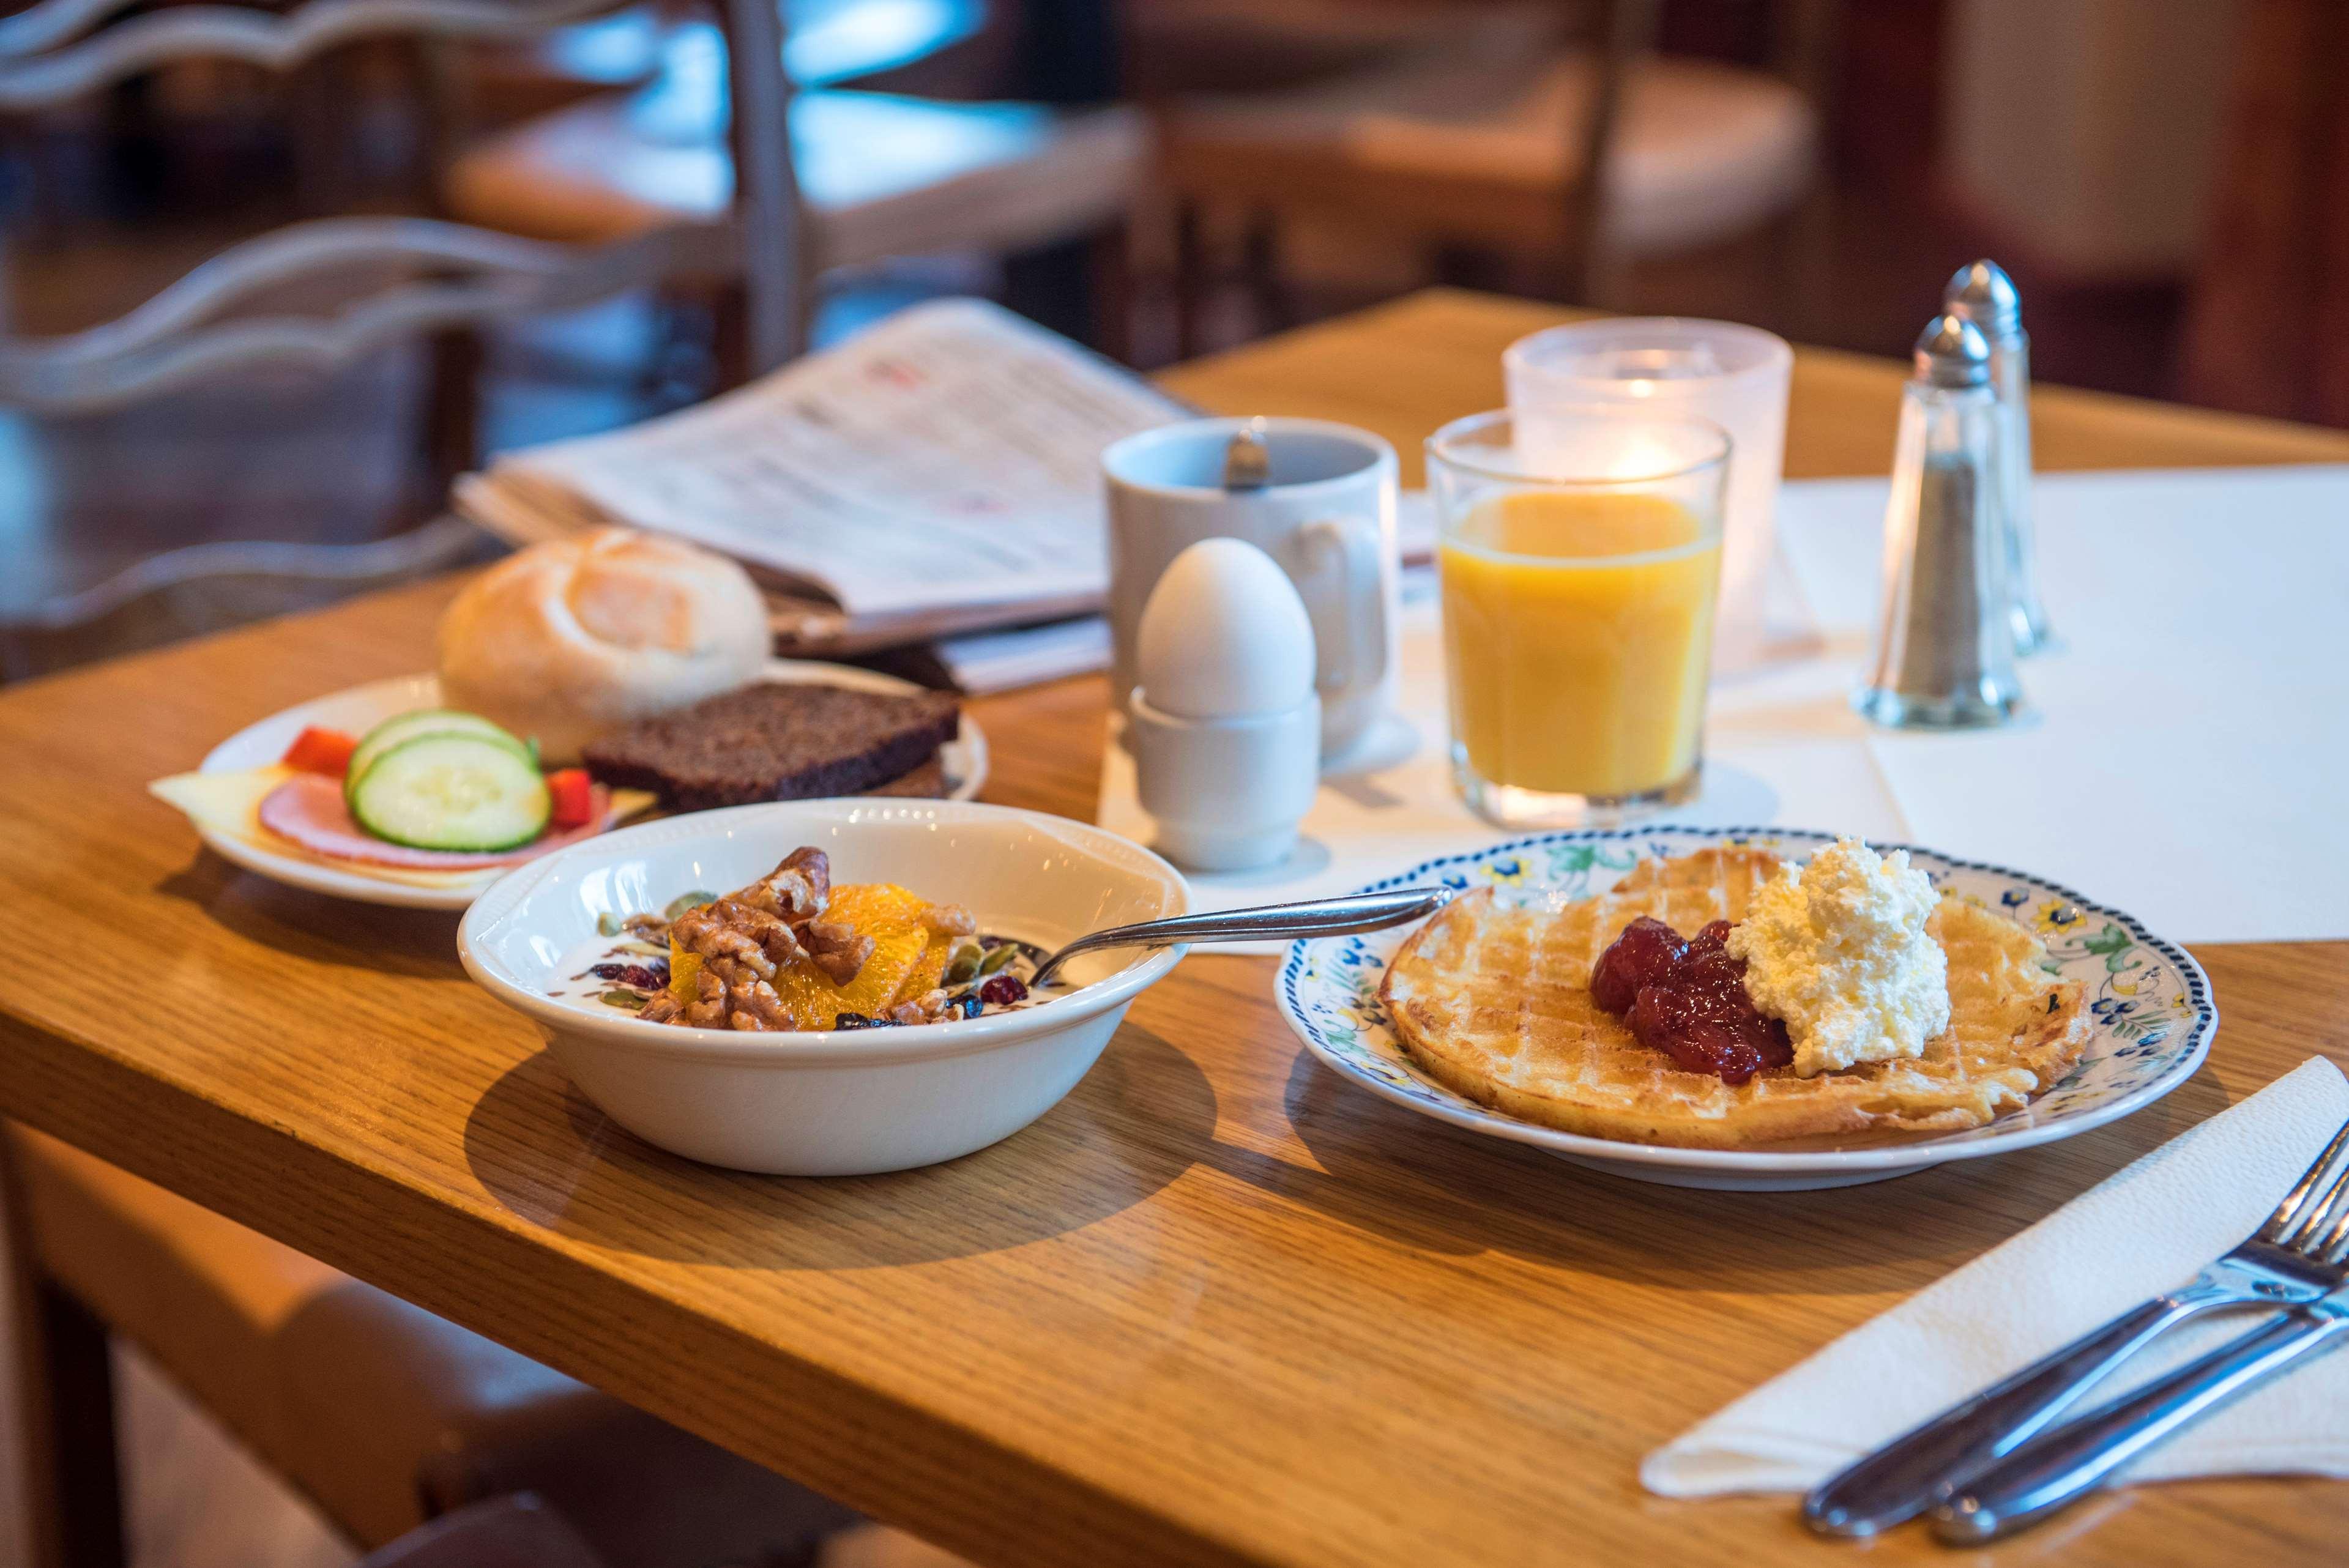 Breakfast in restaurant